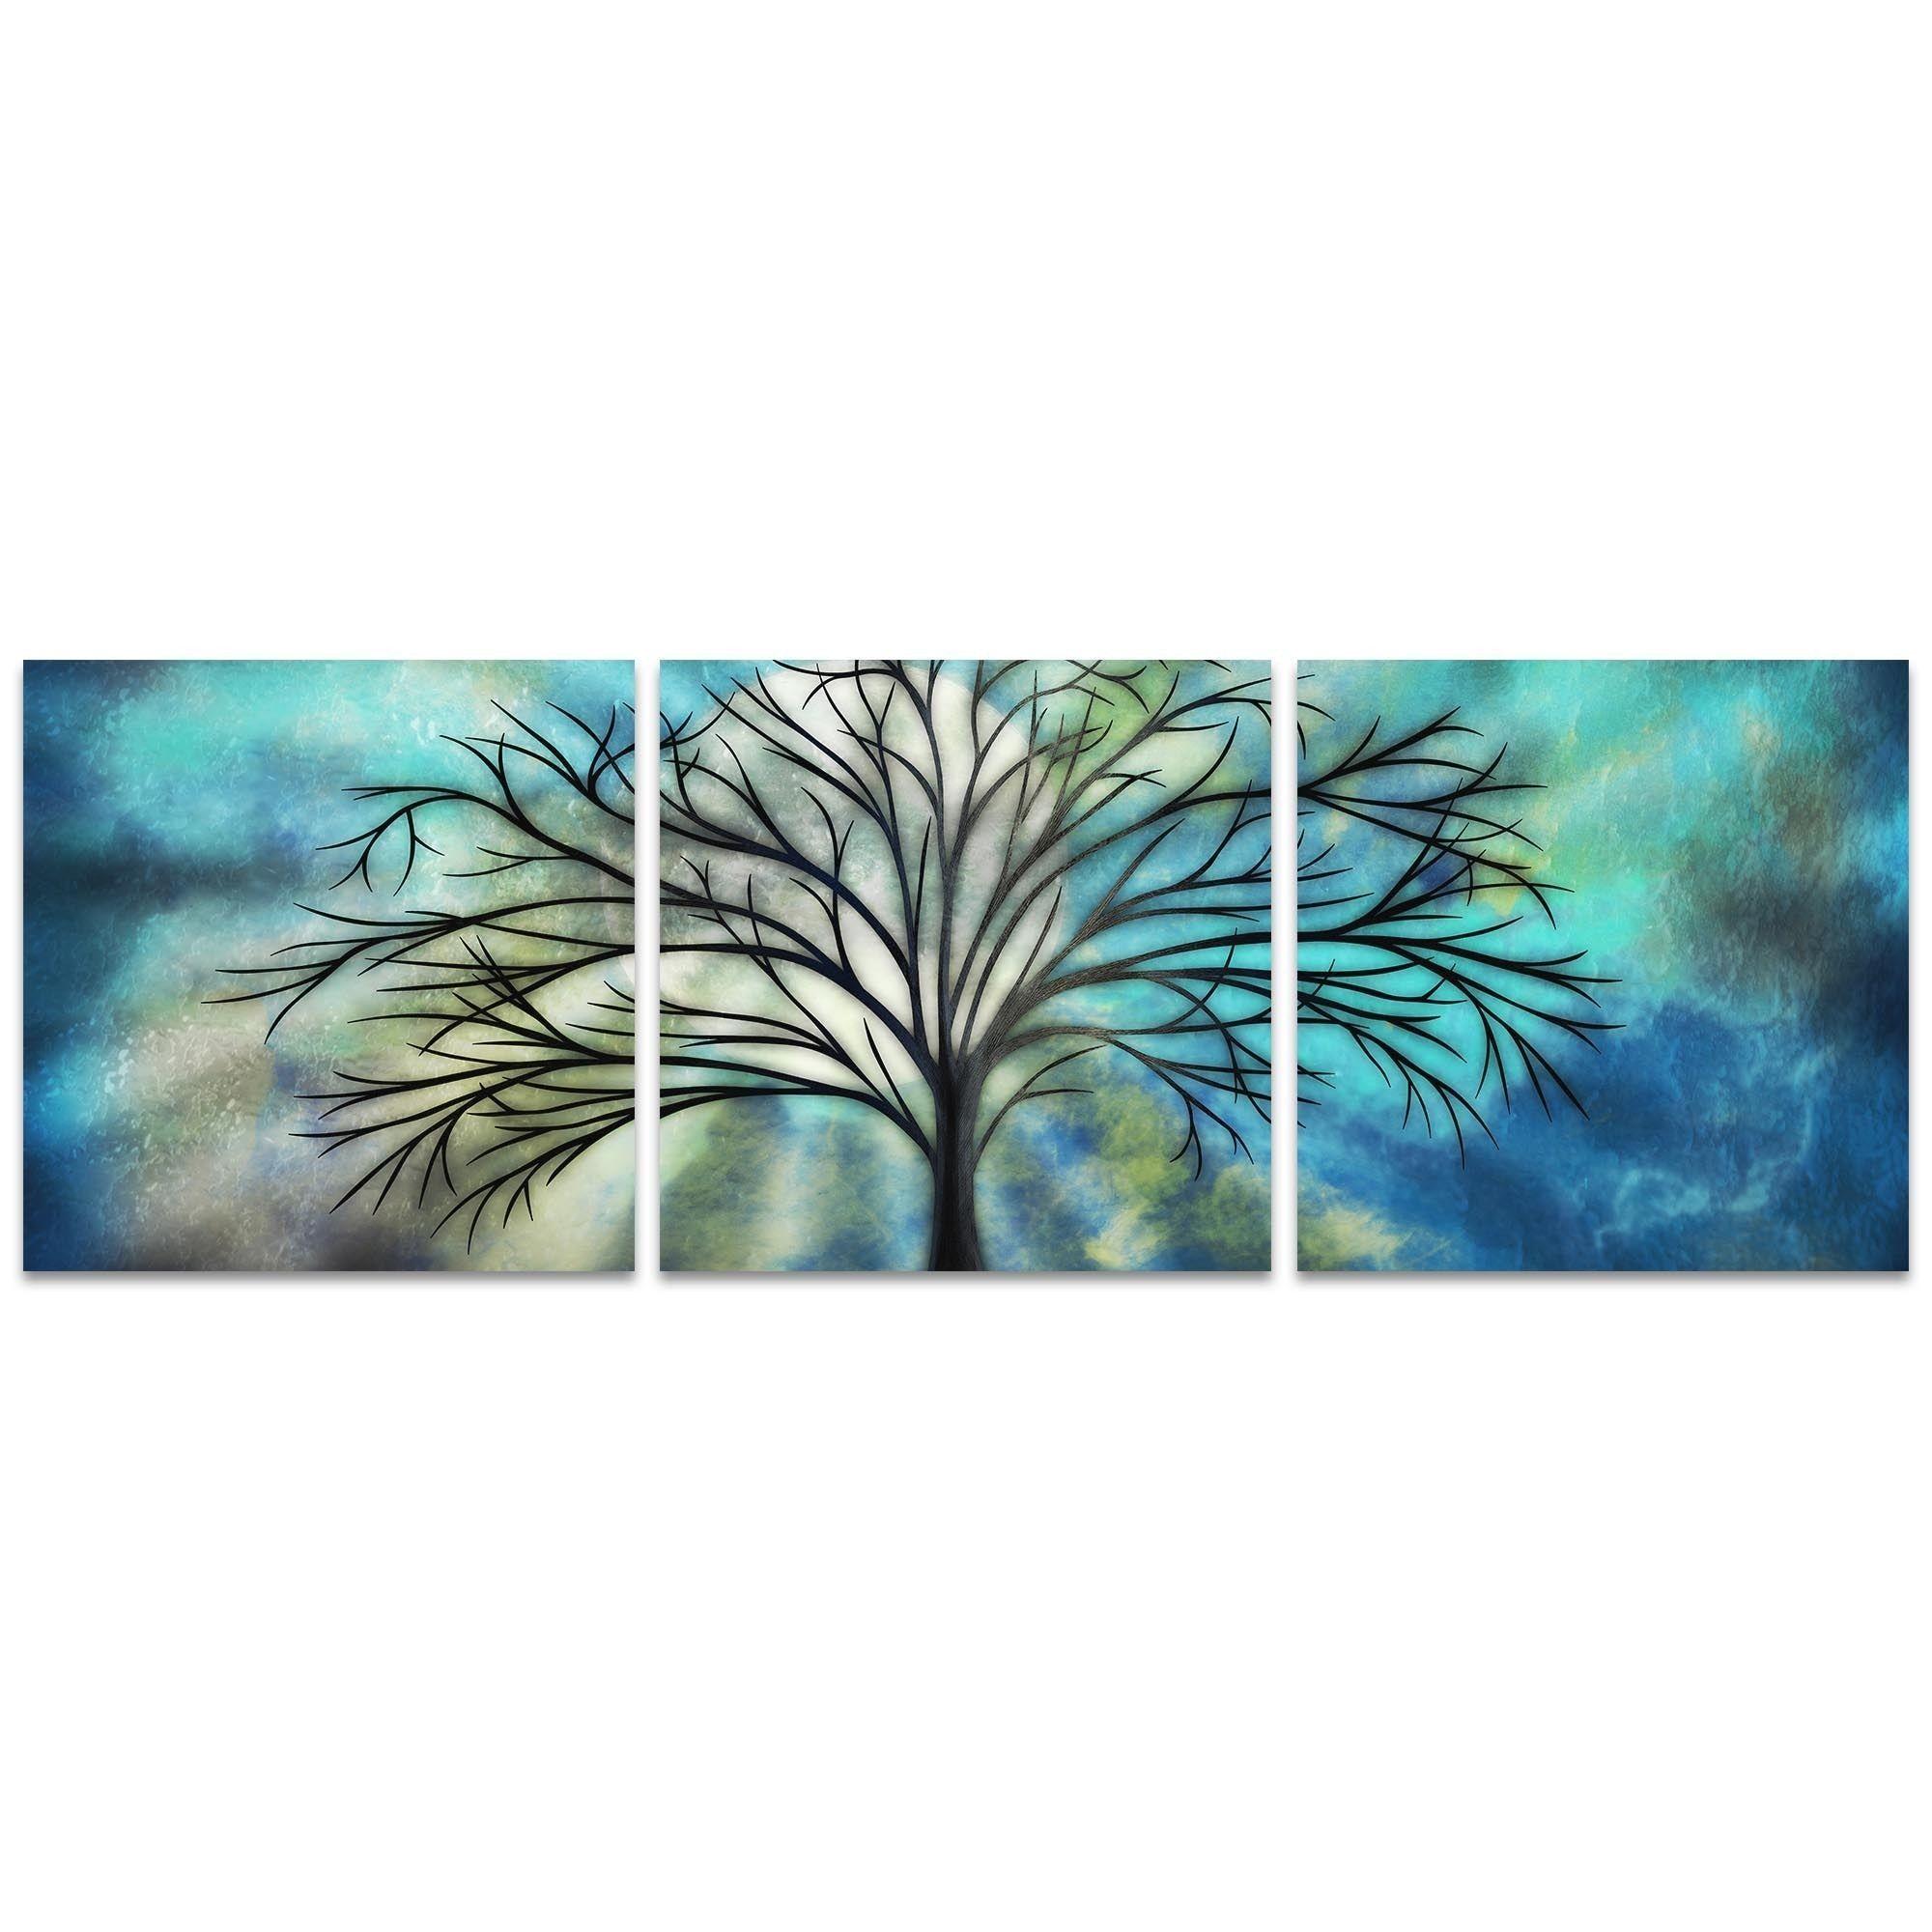 Stephanie fields umoonlight triptych largeu whimsical tree art on